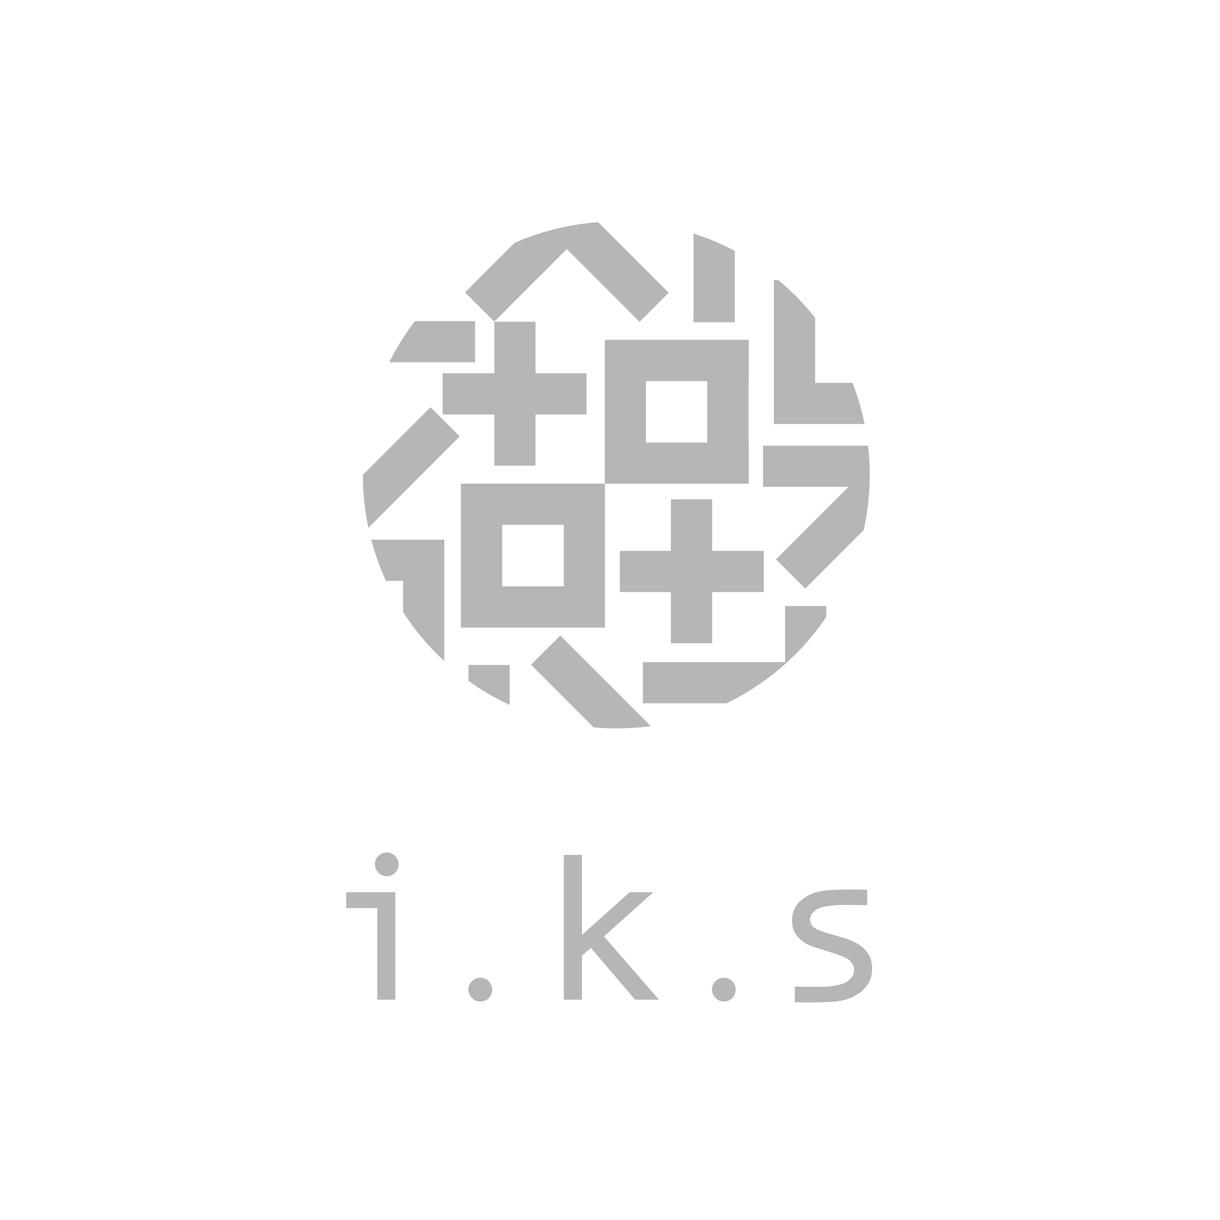 i.k.sdesignのWebサイトをリニューアルします!